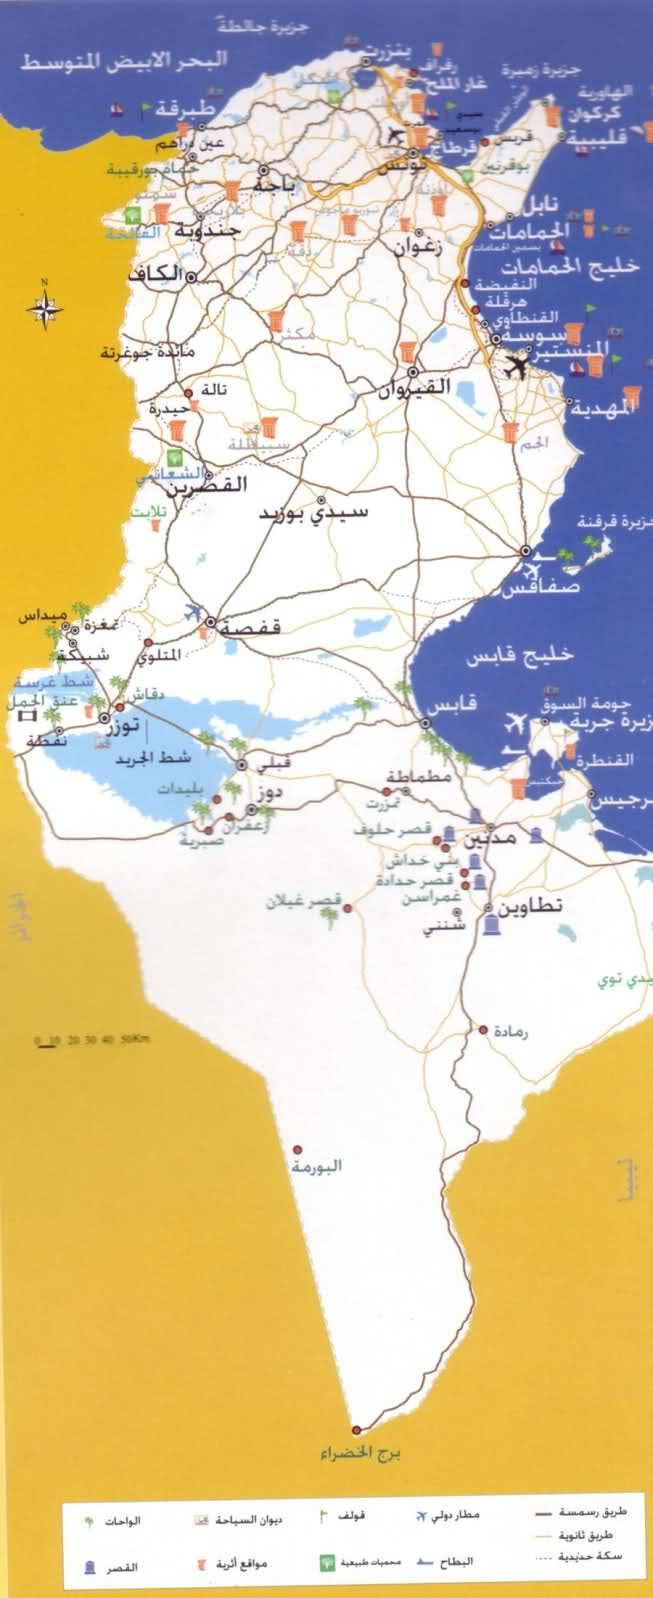 Tunisia.Map.2.jpg